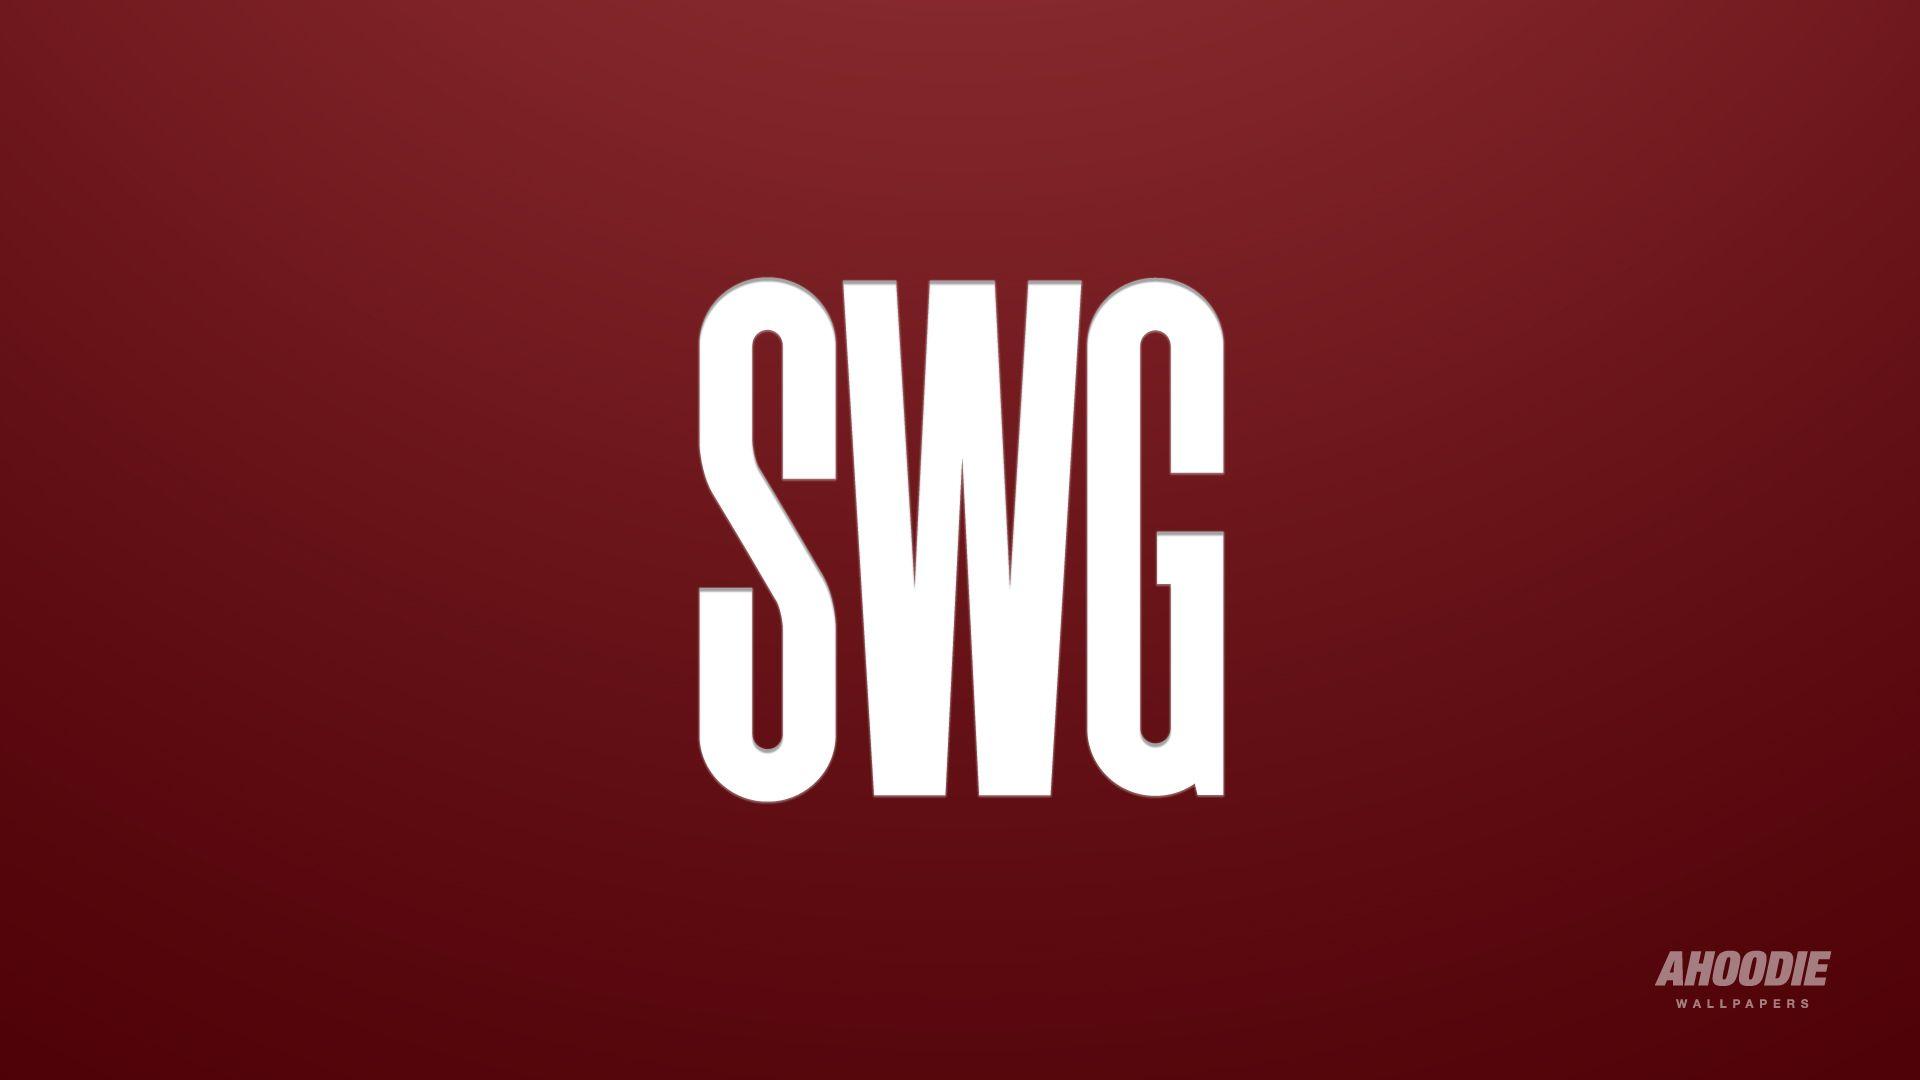 Swag Wallpaper Free Download